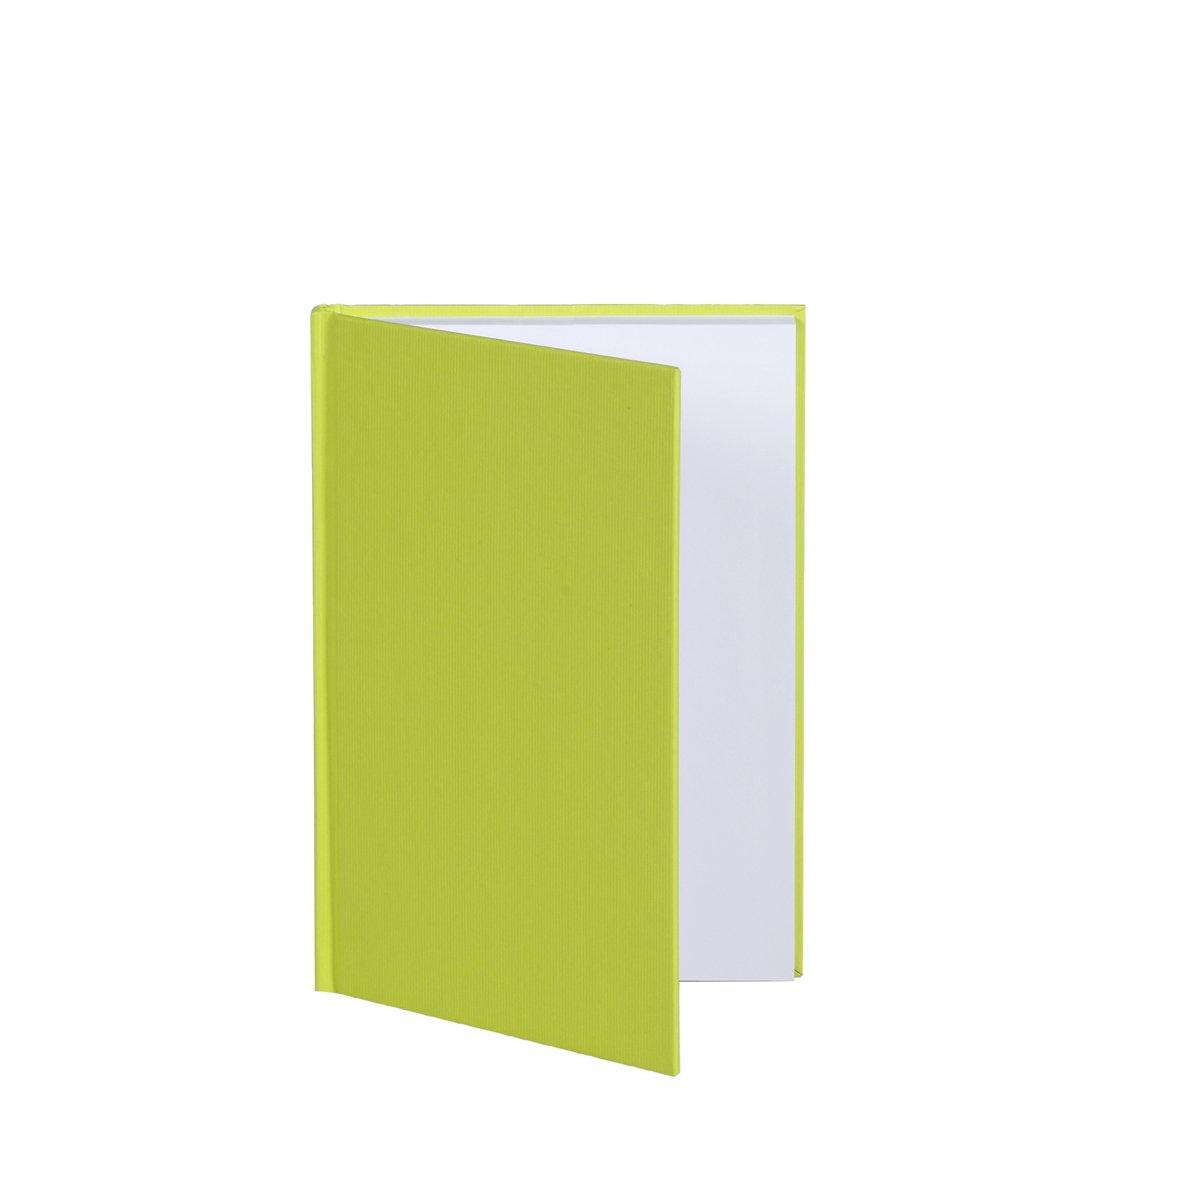 Rössler Papier - - S.O.H.O. Limette - geb. Notizbuch DIN A5 (gerippte Struktur) - Liefermenge  5 Stück